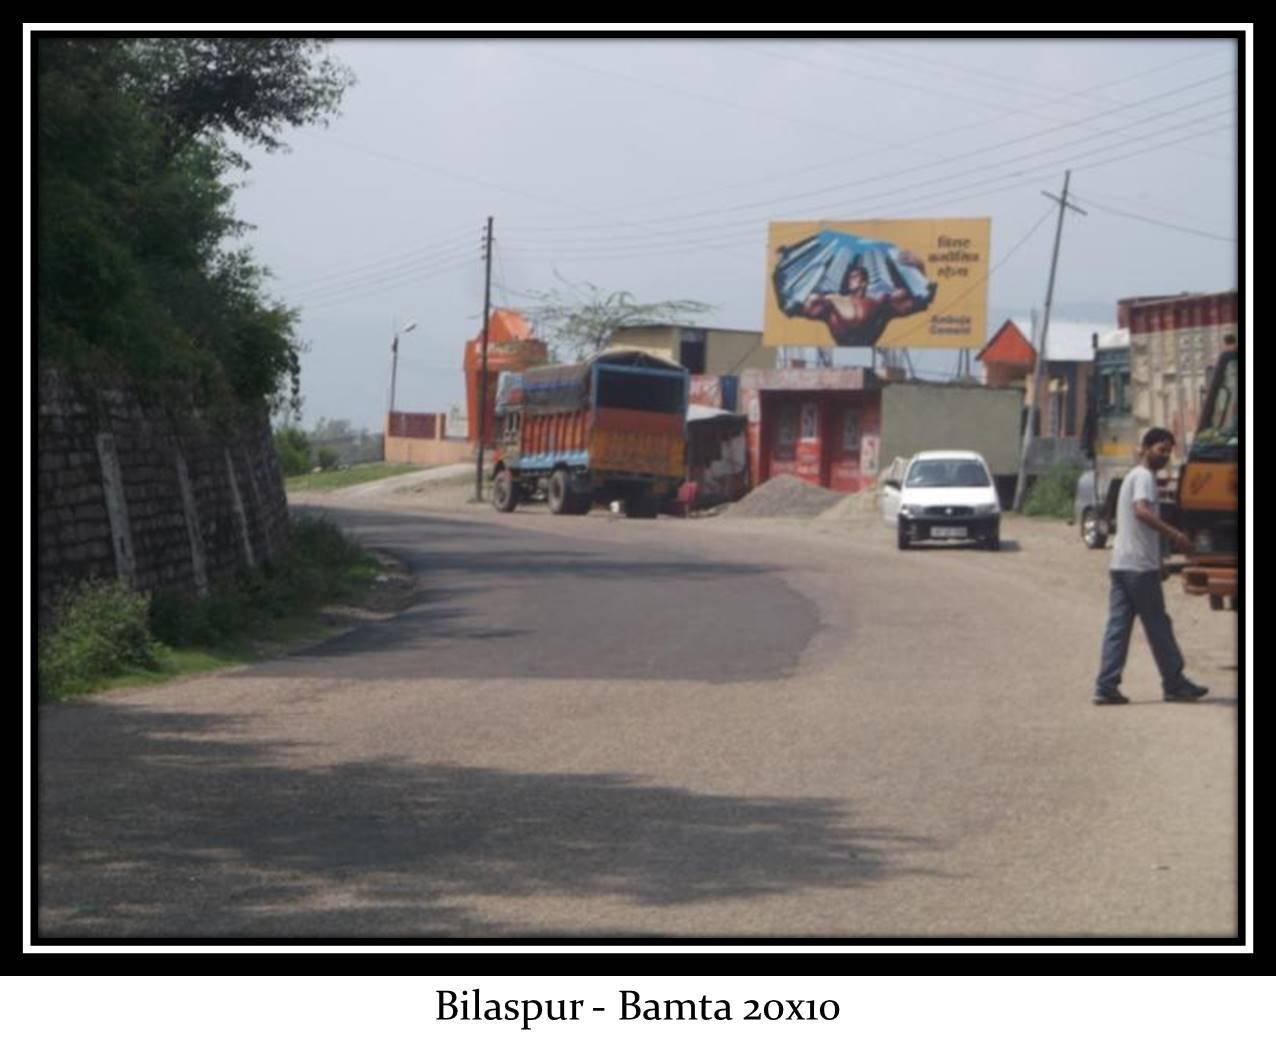 Bamta, Bilaspur